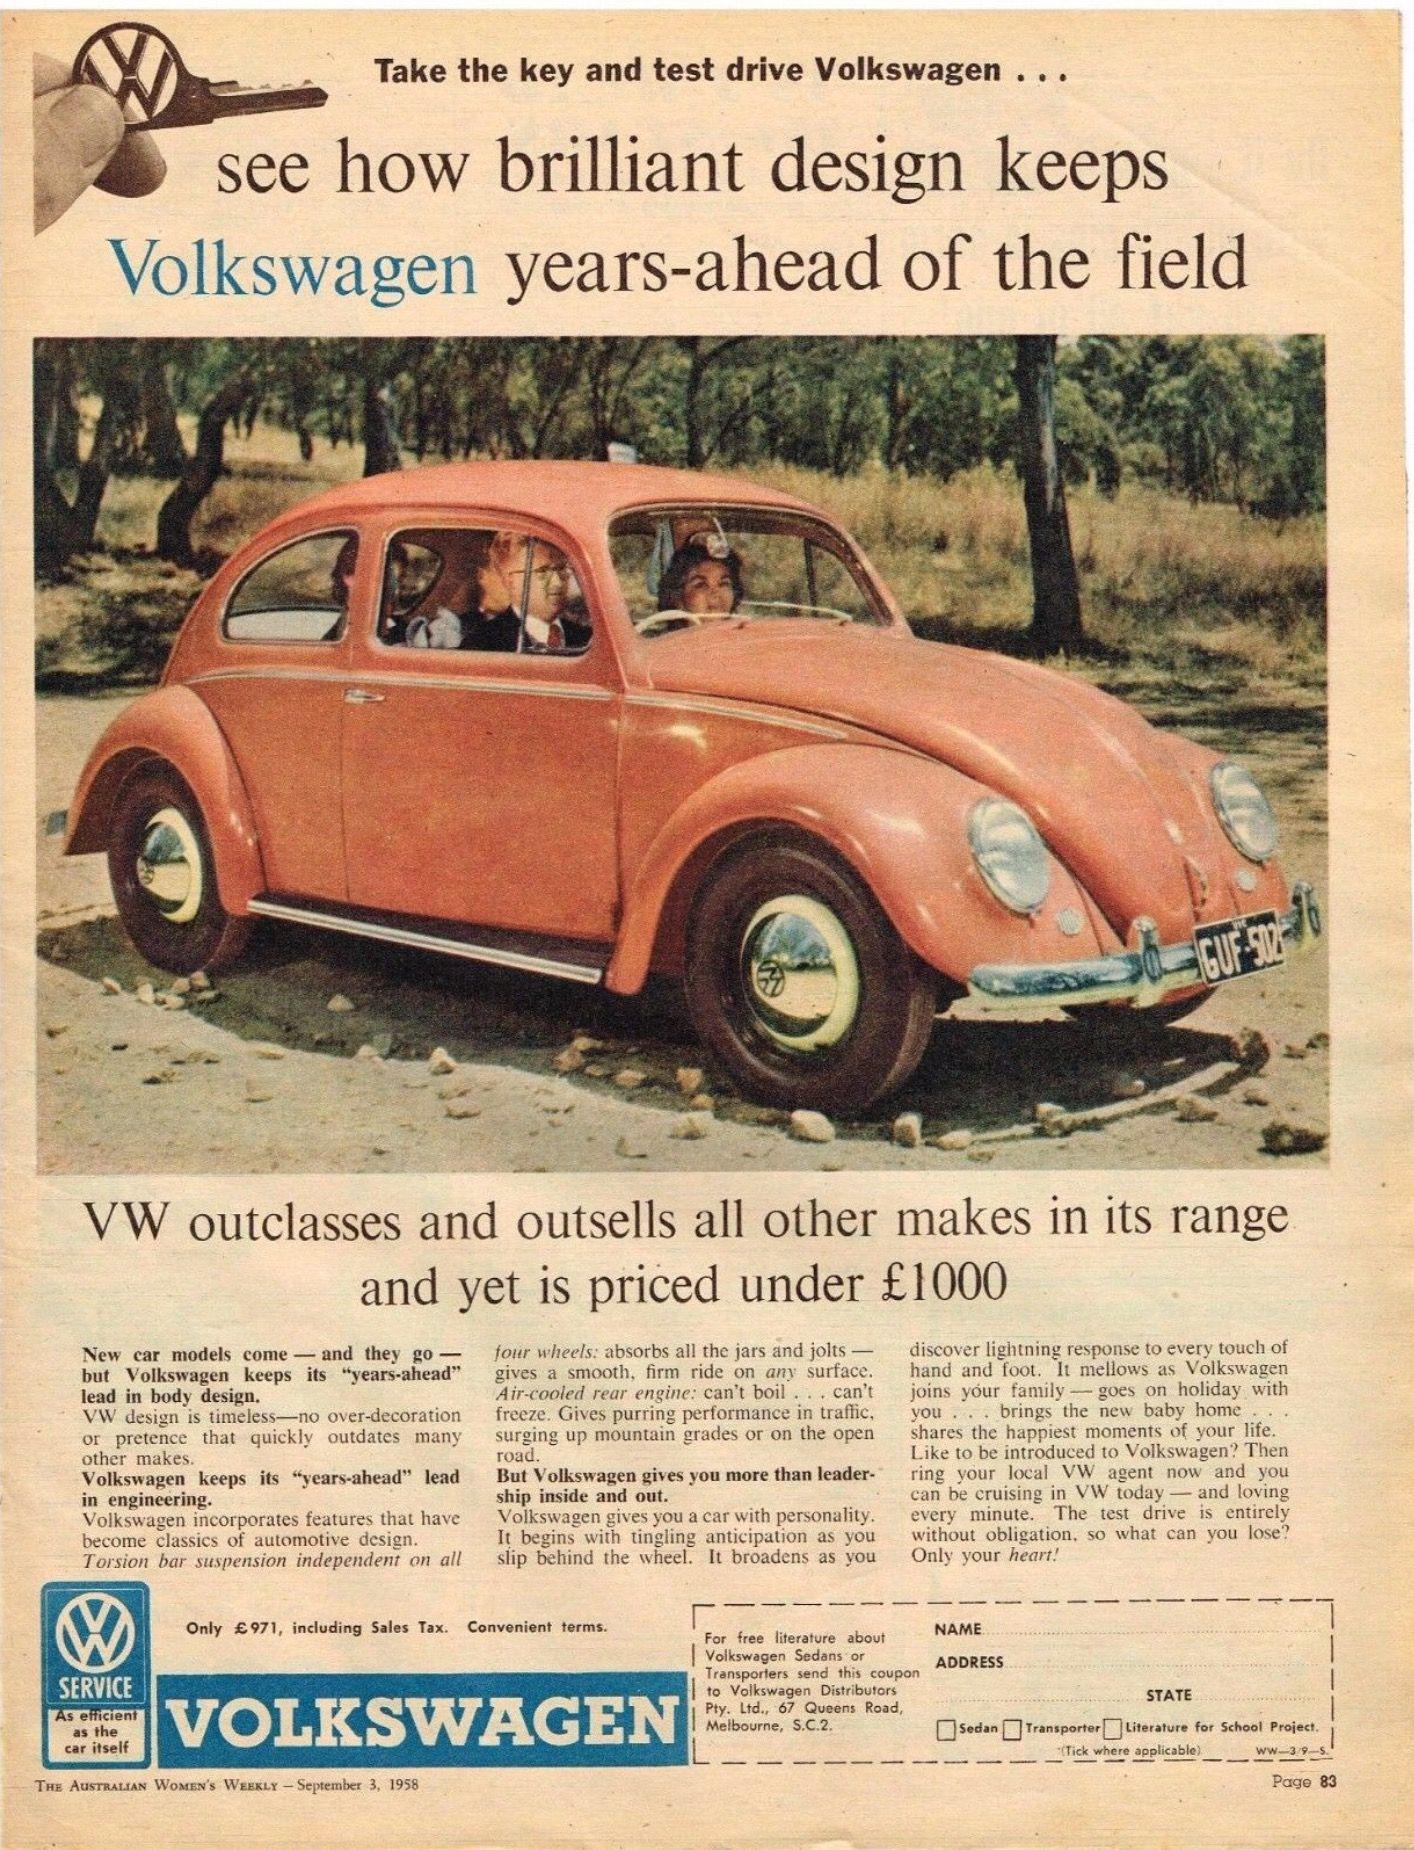 Pin by Jamie Tadsen on Volkswagen Classics! | Pinterest | Vw ...